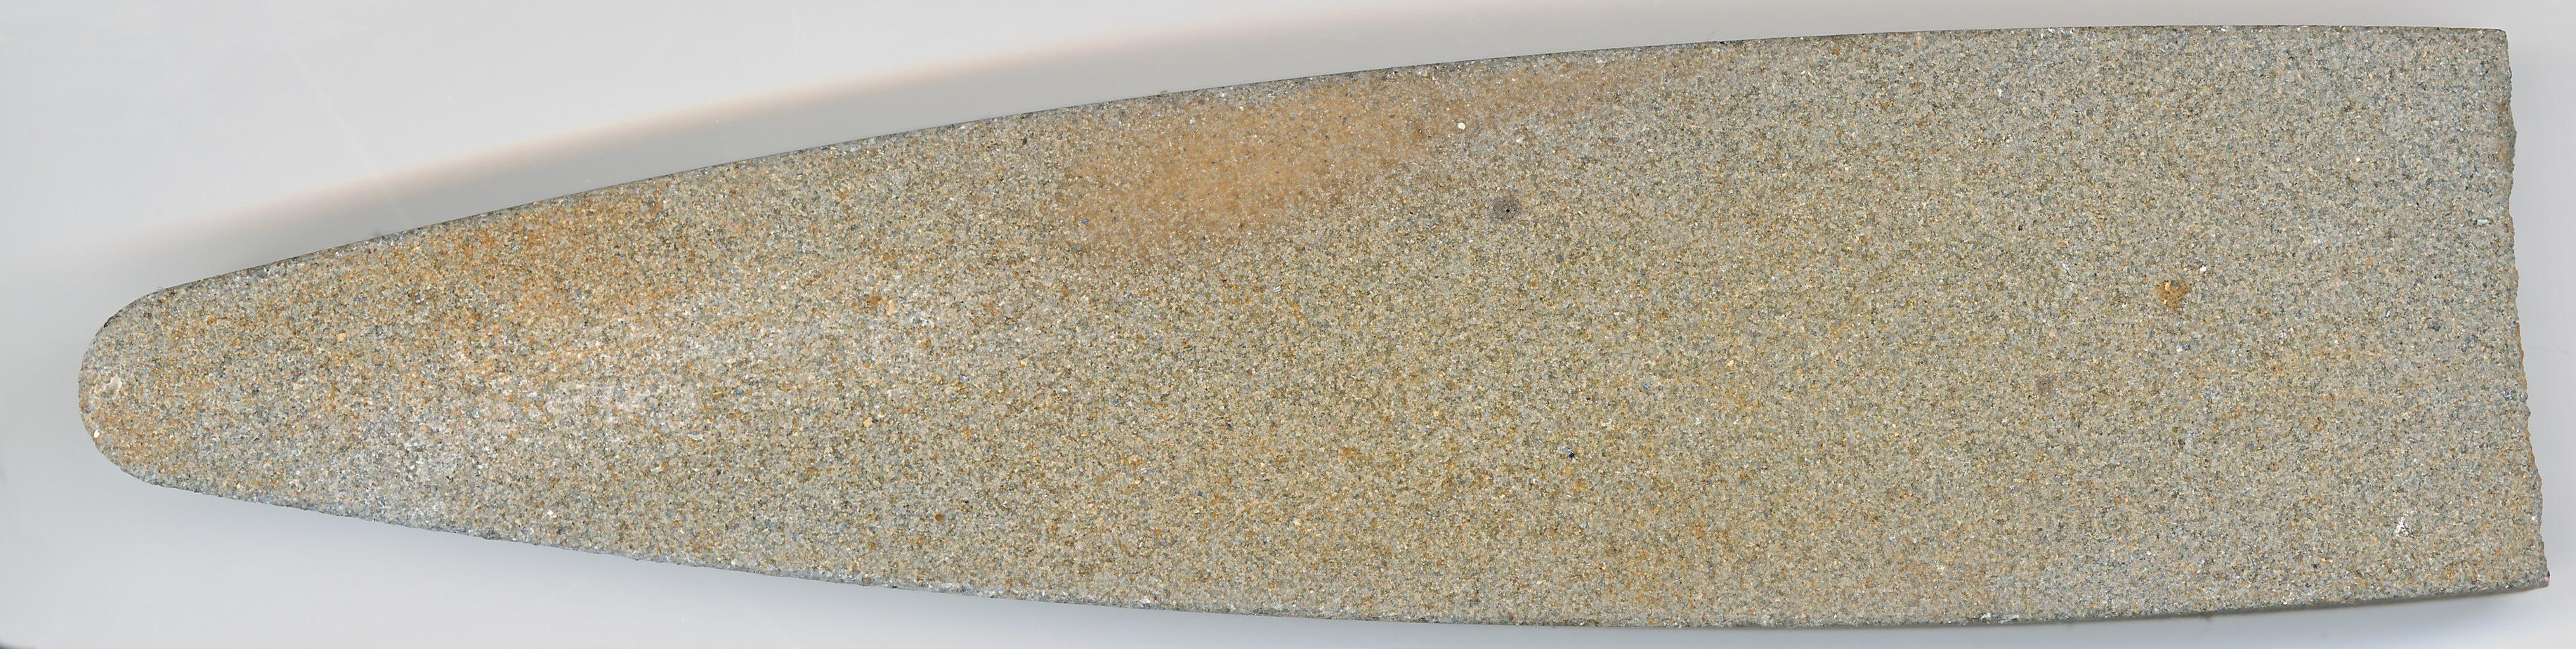 Osełka kamienna